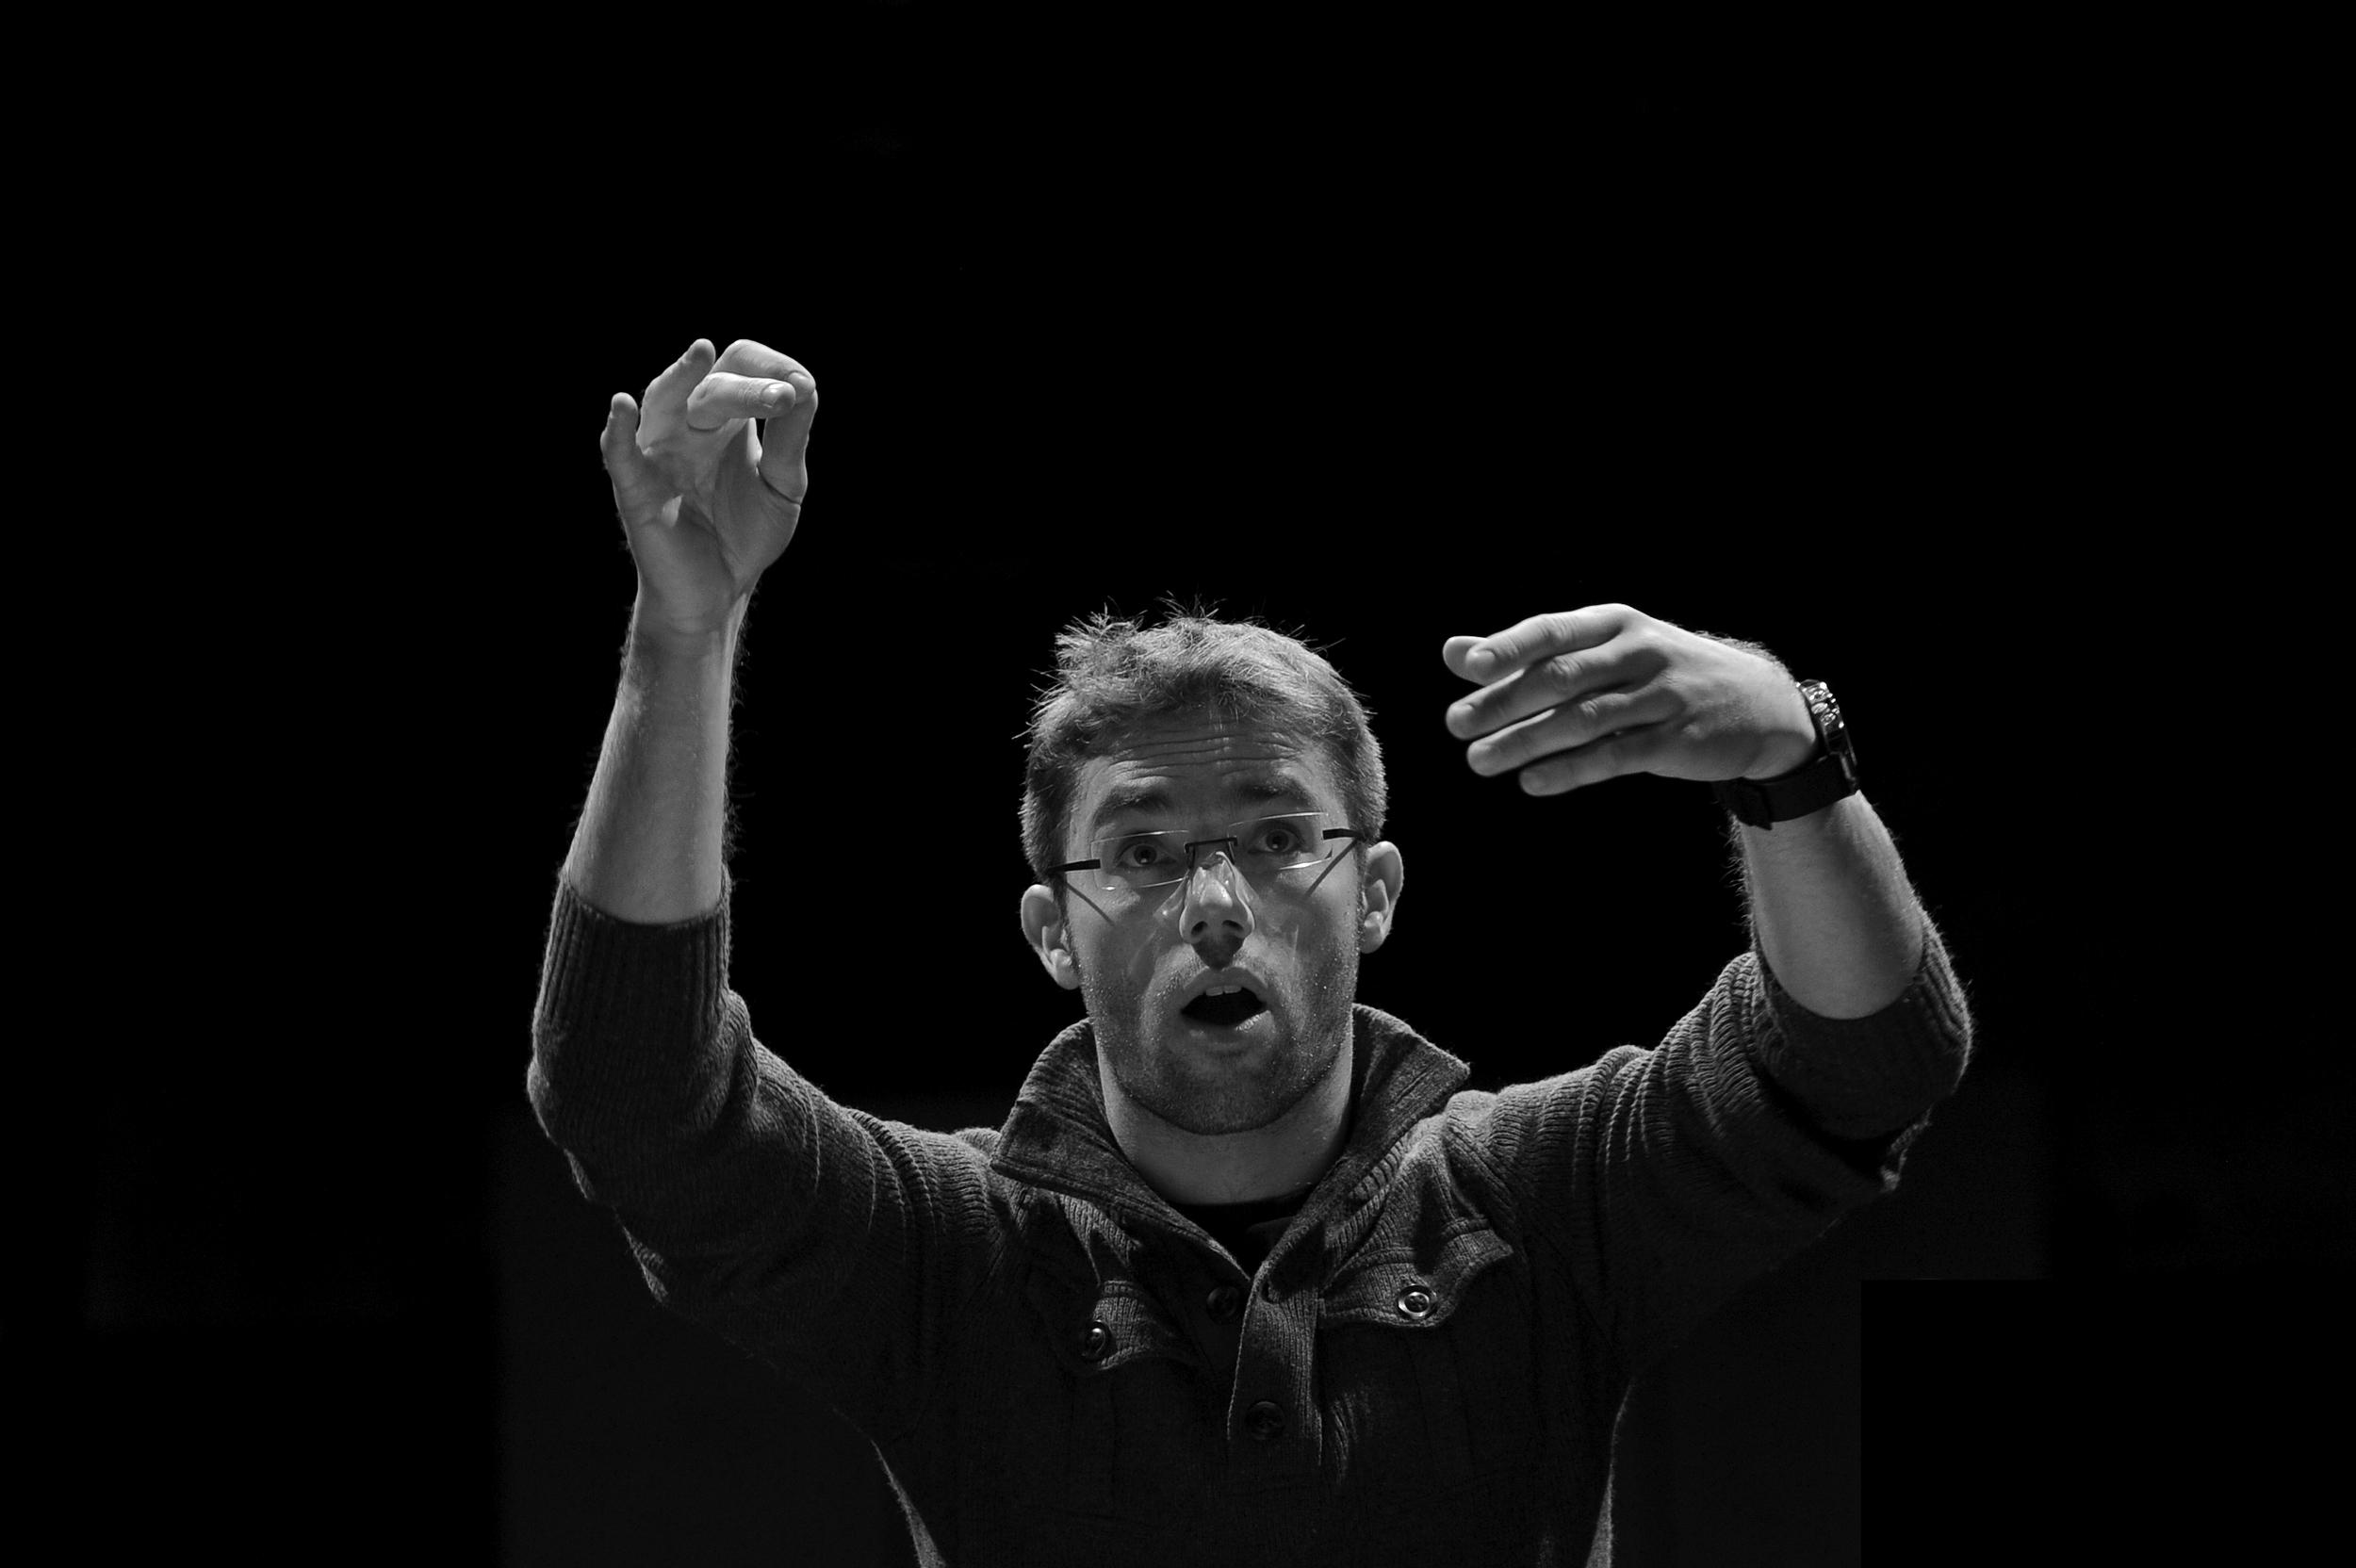 Teatro alle Tese, Venice| Ensemble intercontemporain  Berio,  Laboritus II  (in rehearsal with Accentus)  © Jean Radel - October 2010